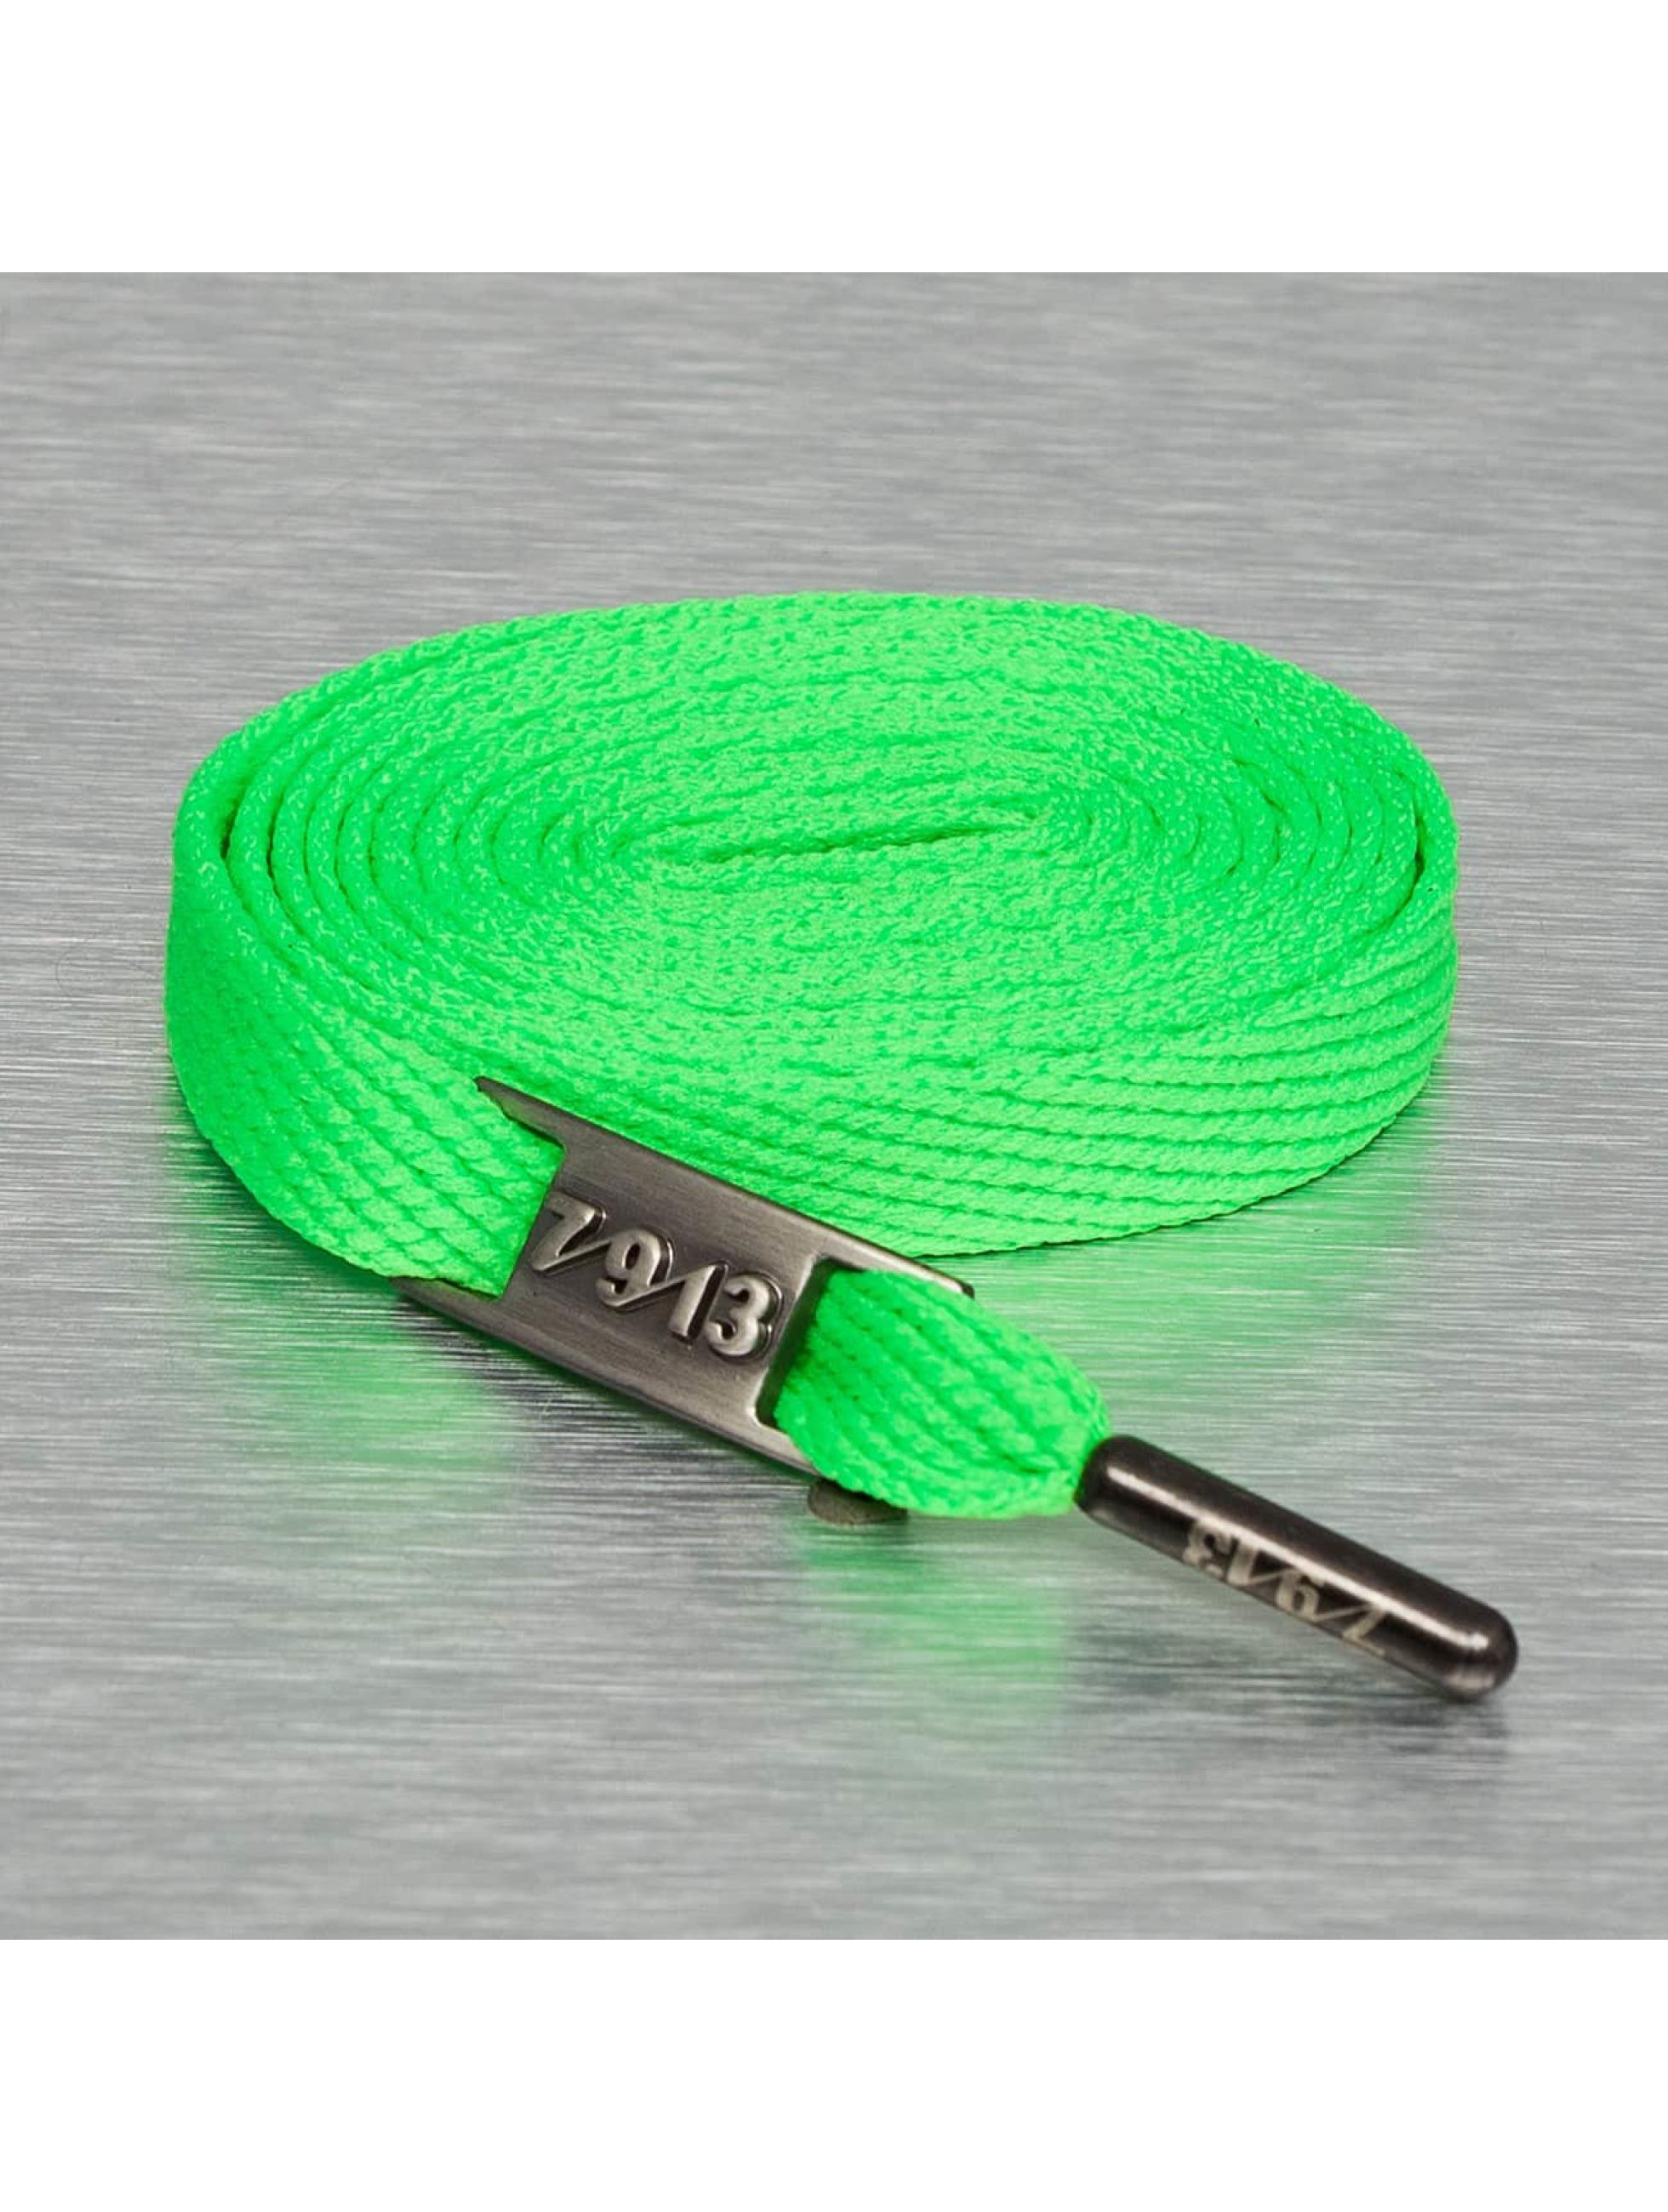 Schuhzubehör Full Metal in grün